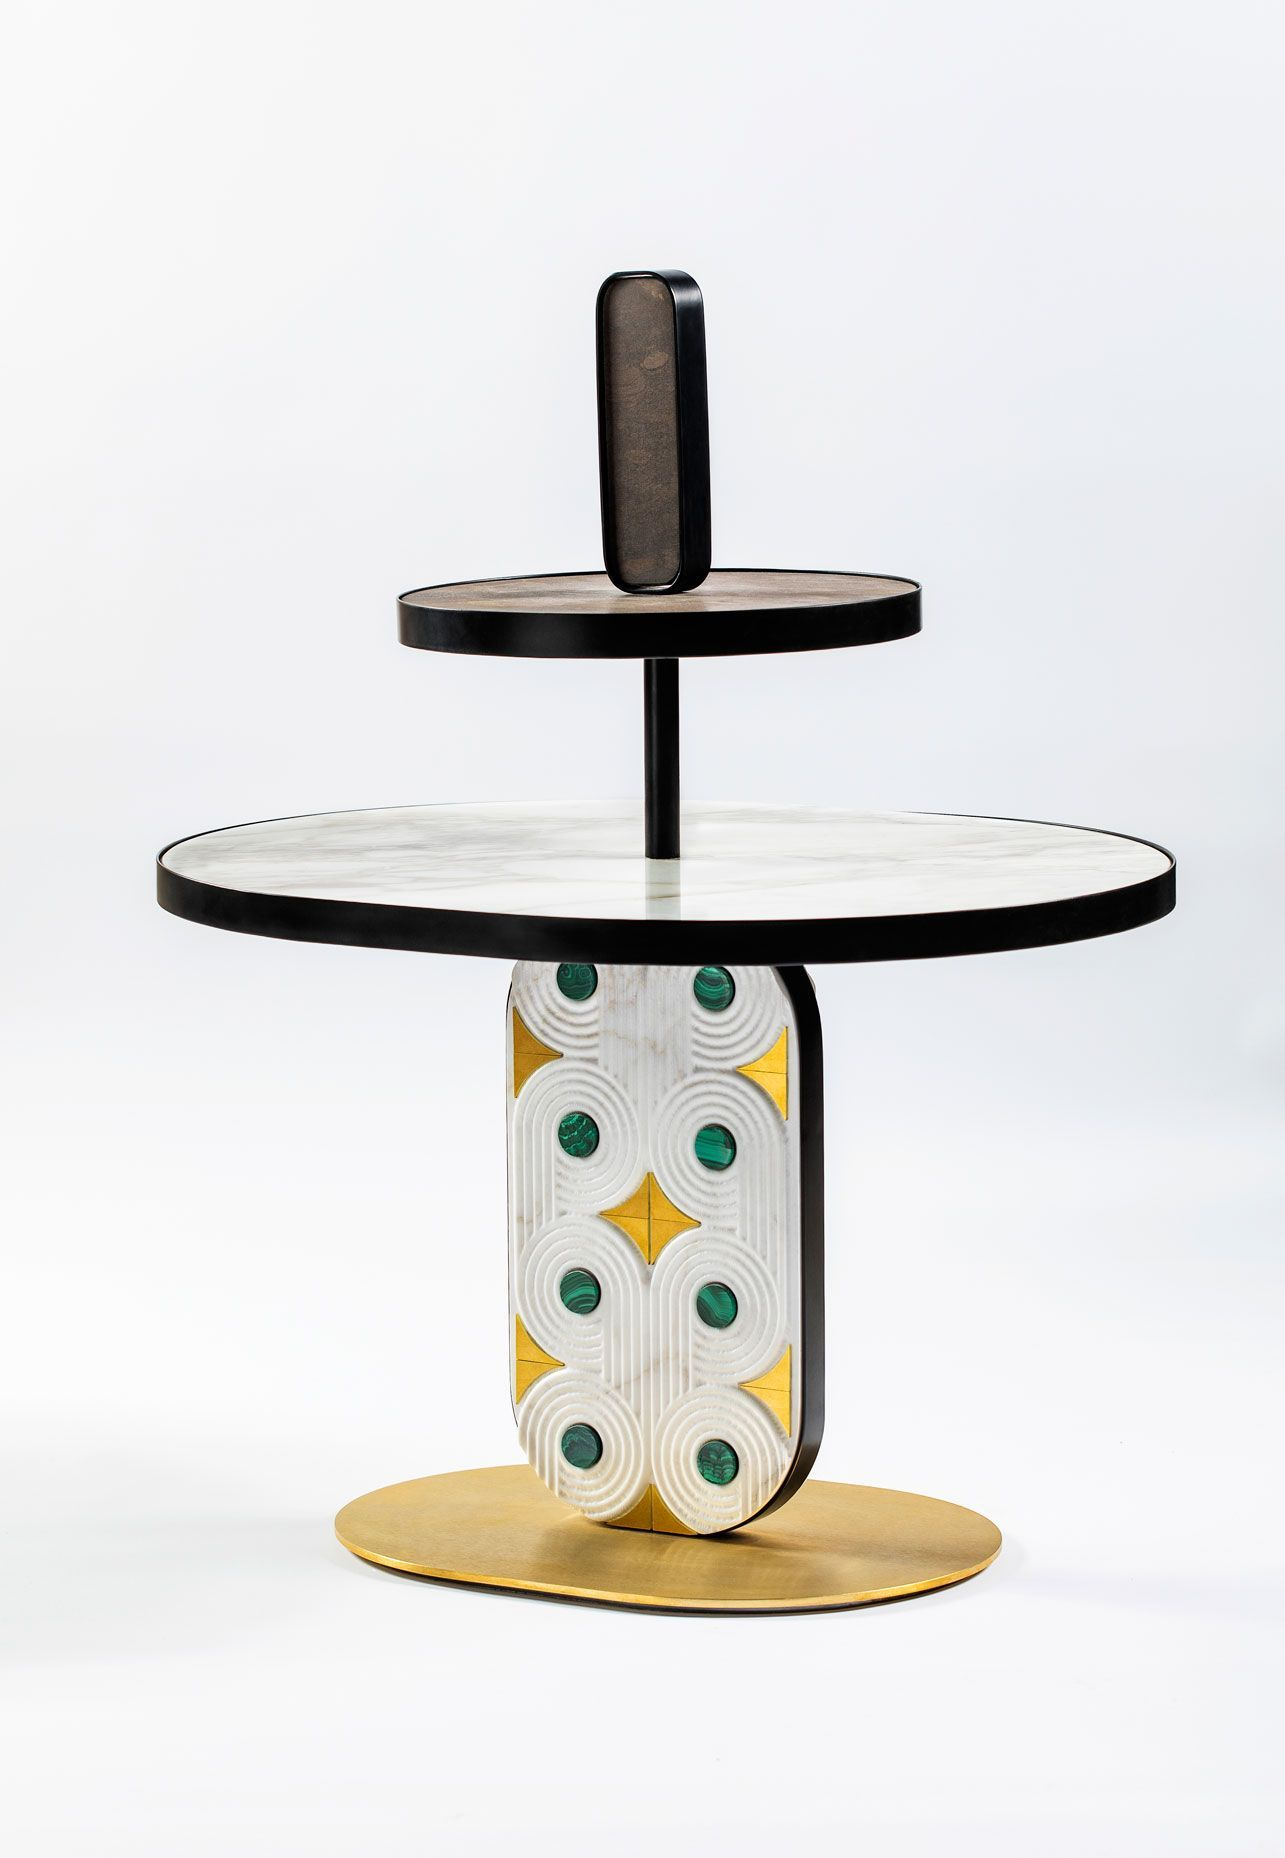 Tavolo Pranzo Art Deco pin su 茶几-边几-案几-角几